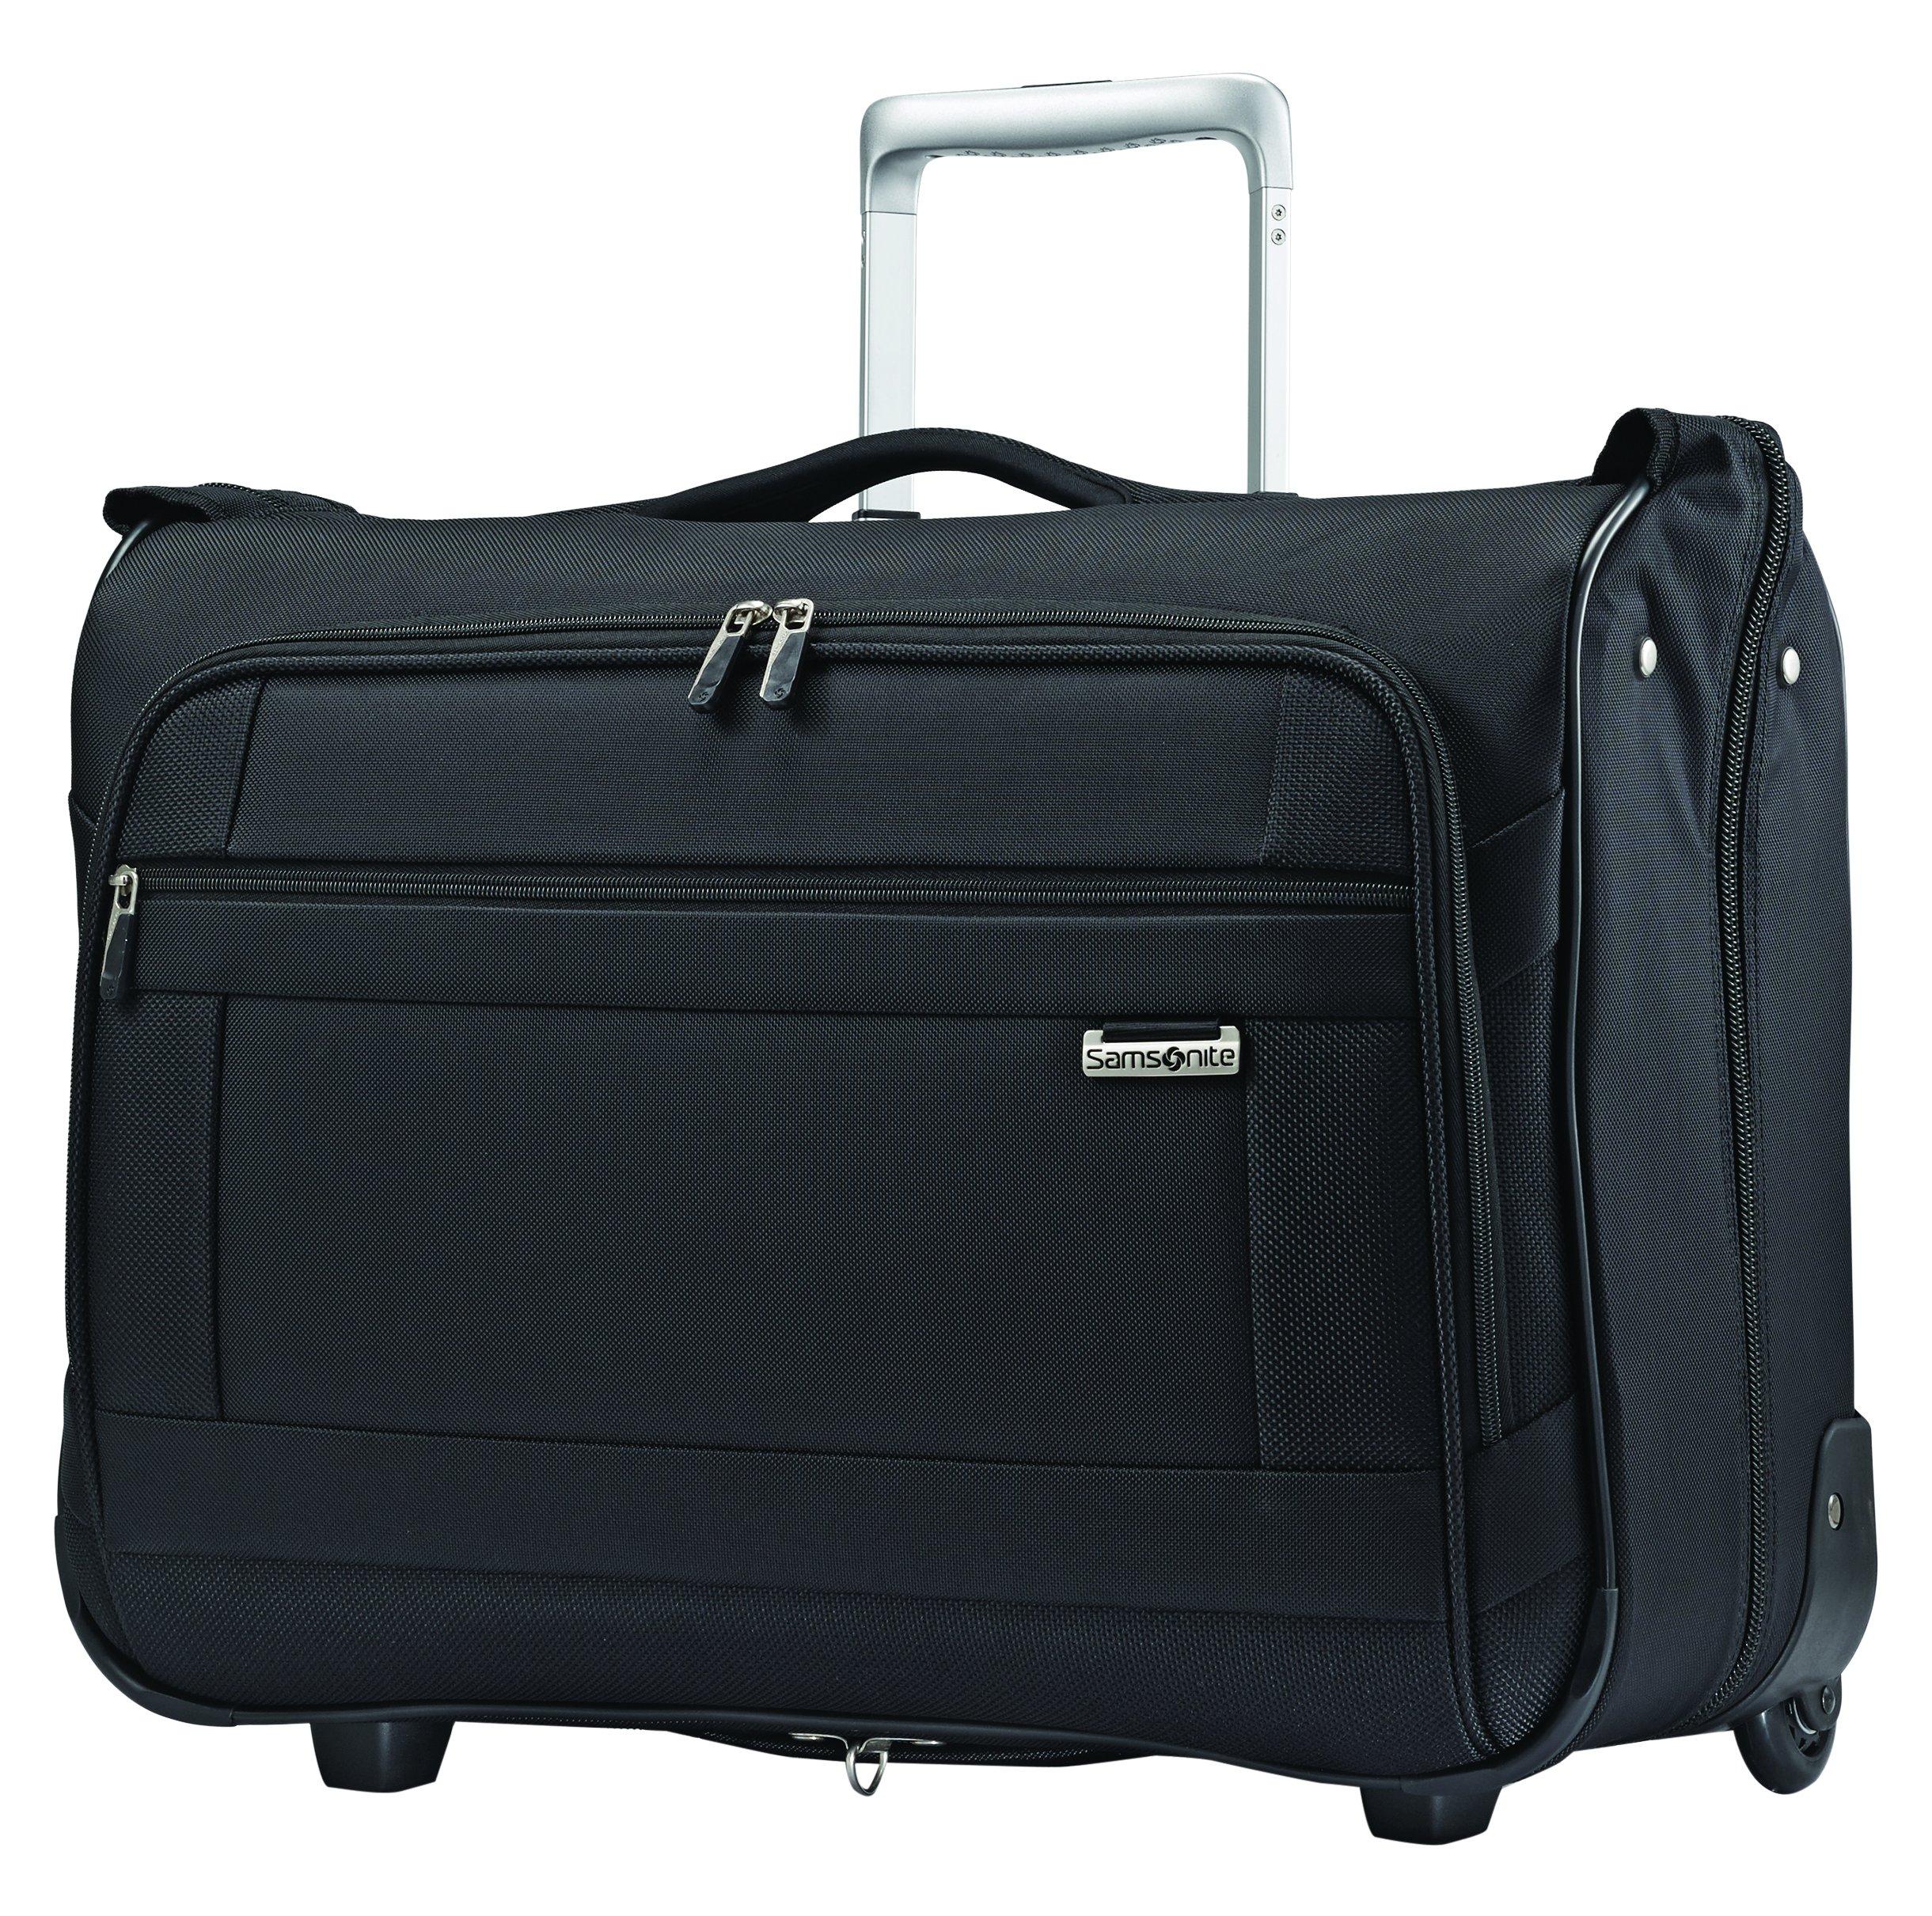 Samsonite Solyte Softside Carry-on Wheeled Garment Bag, Black